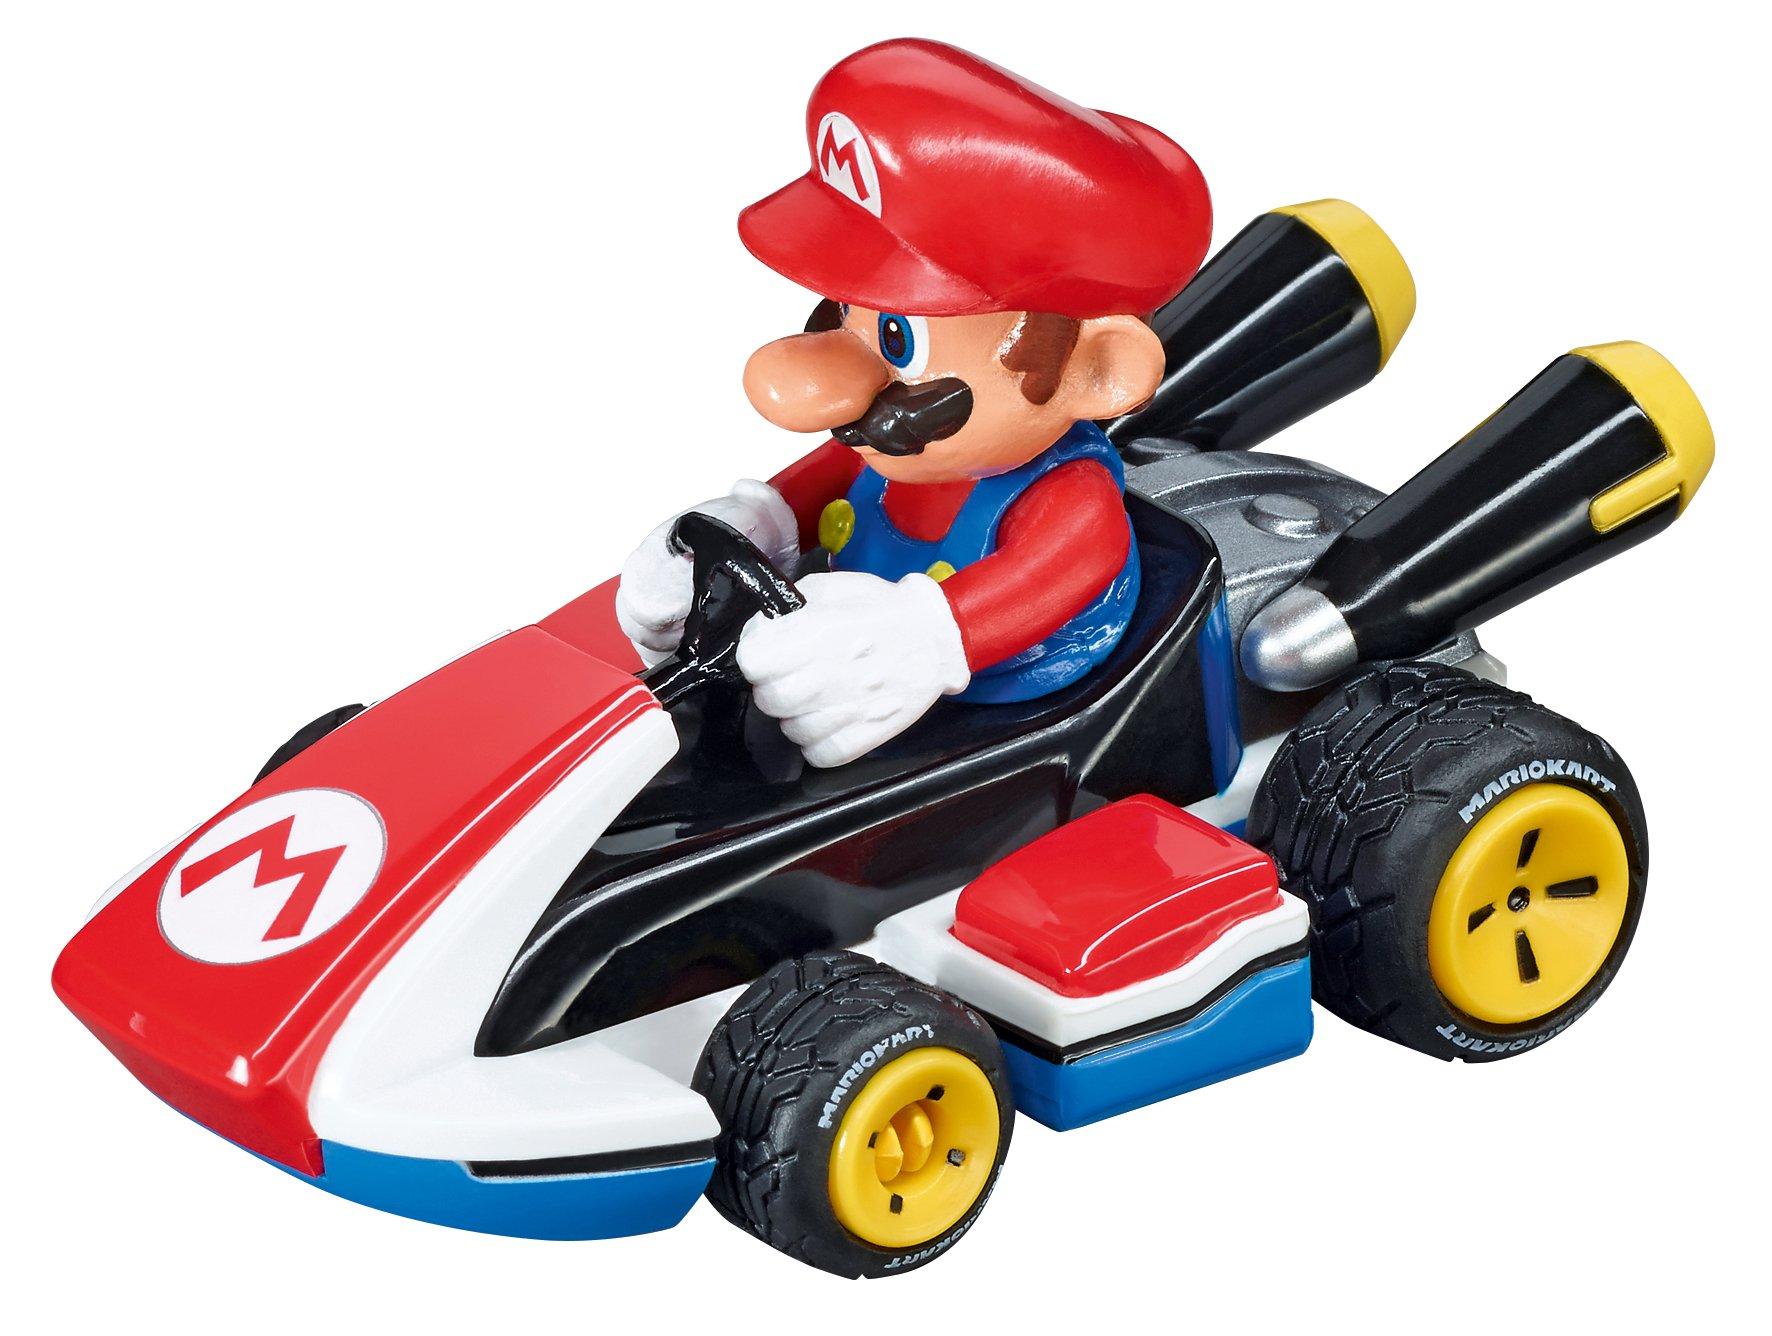 Carrera Carrerag GO Mario Slot Car Vehicle Racing by Carrera